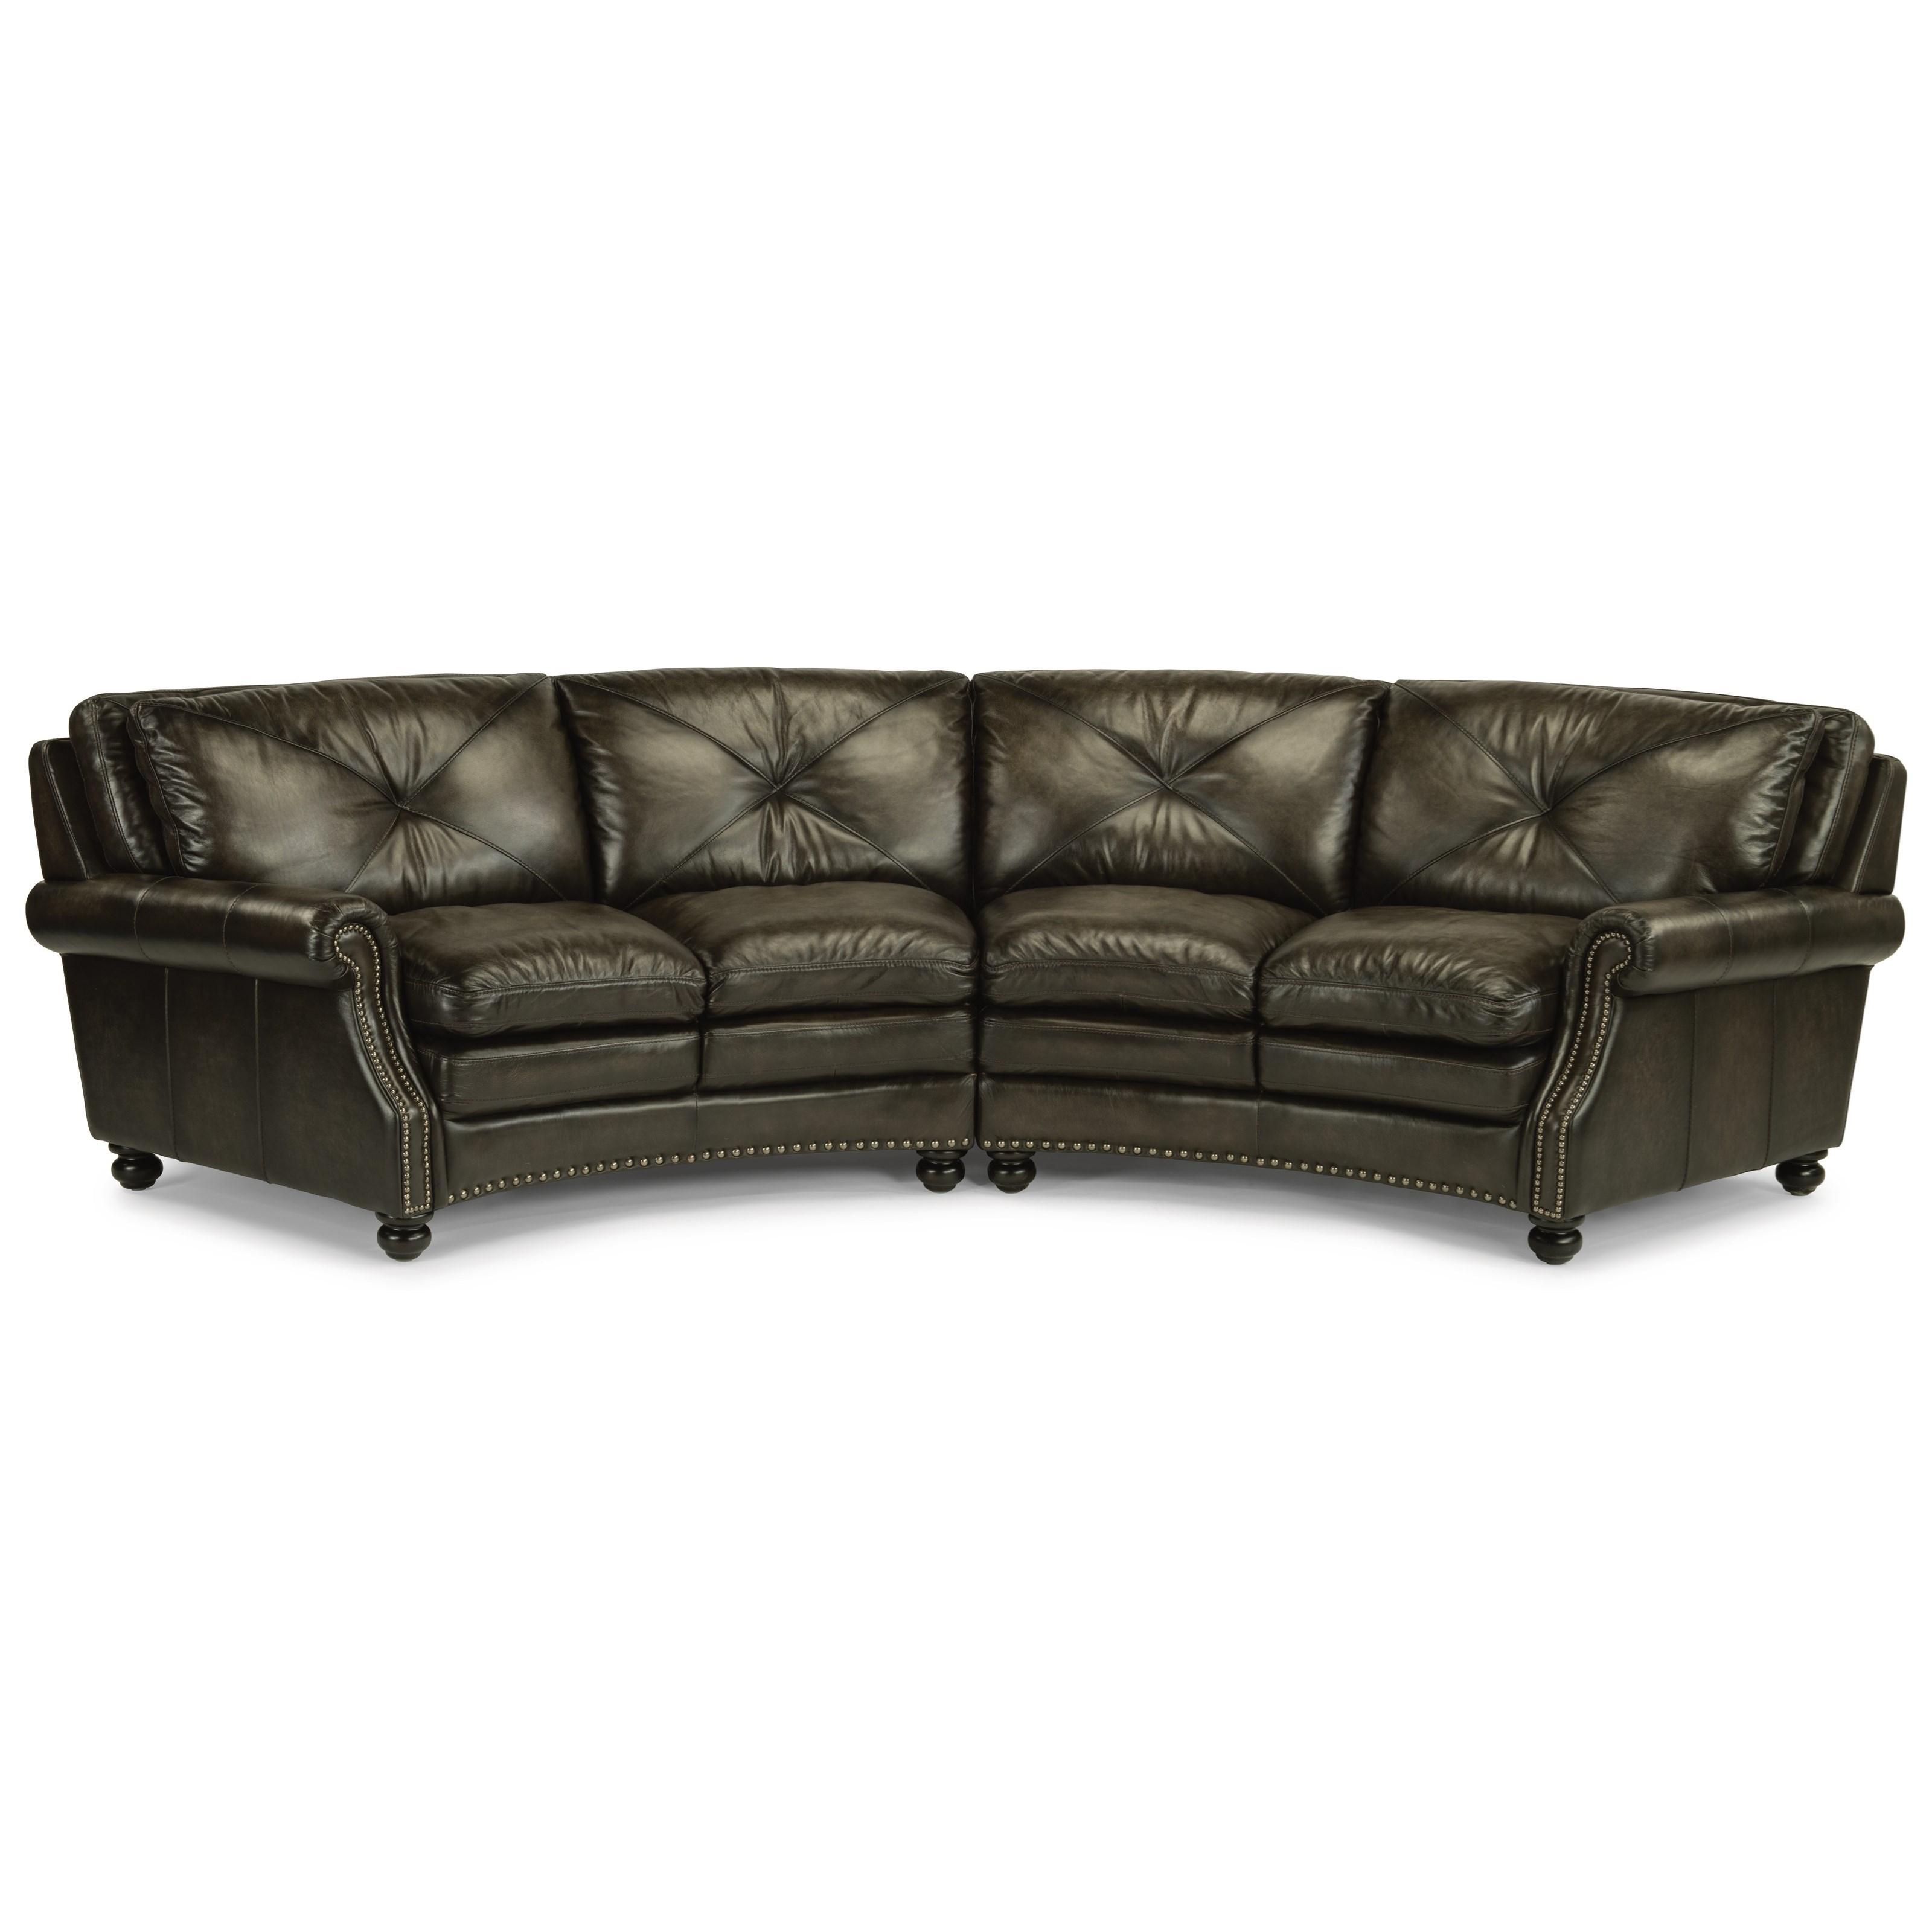 Superbe Flexsteel Latitudes SuffolkRound Sectional Sofa ...